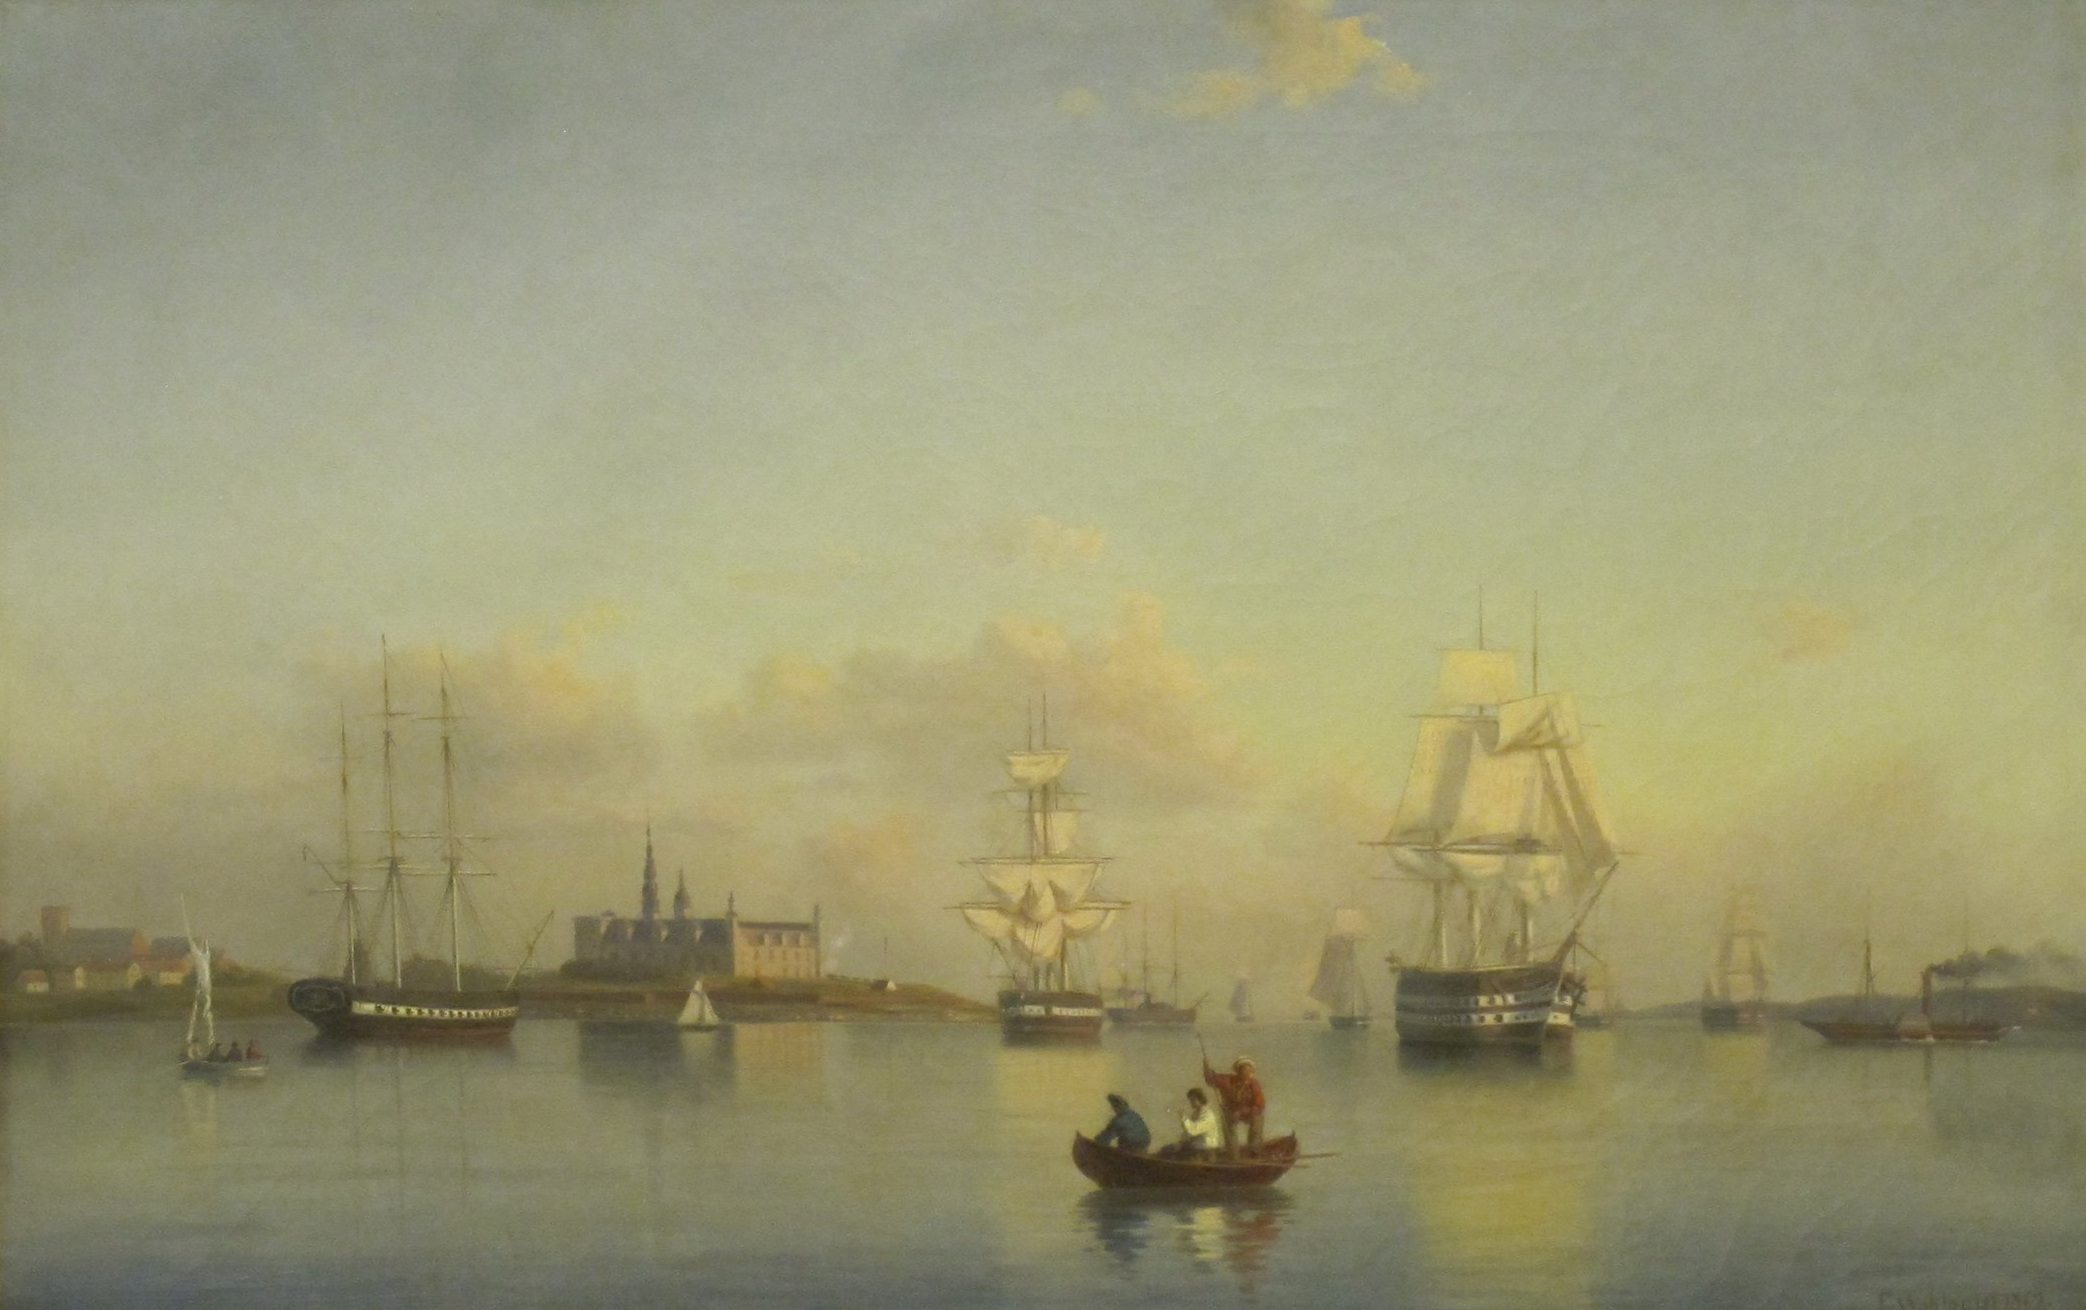 Örlogsfartyg i stiltje vid Kronborg. Ehrenfried Wahlqvist, 1862. Sjöfartsmuseet.